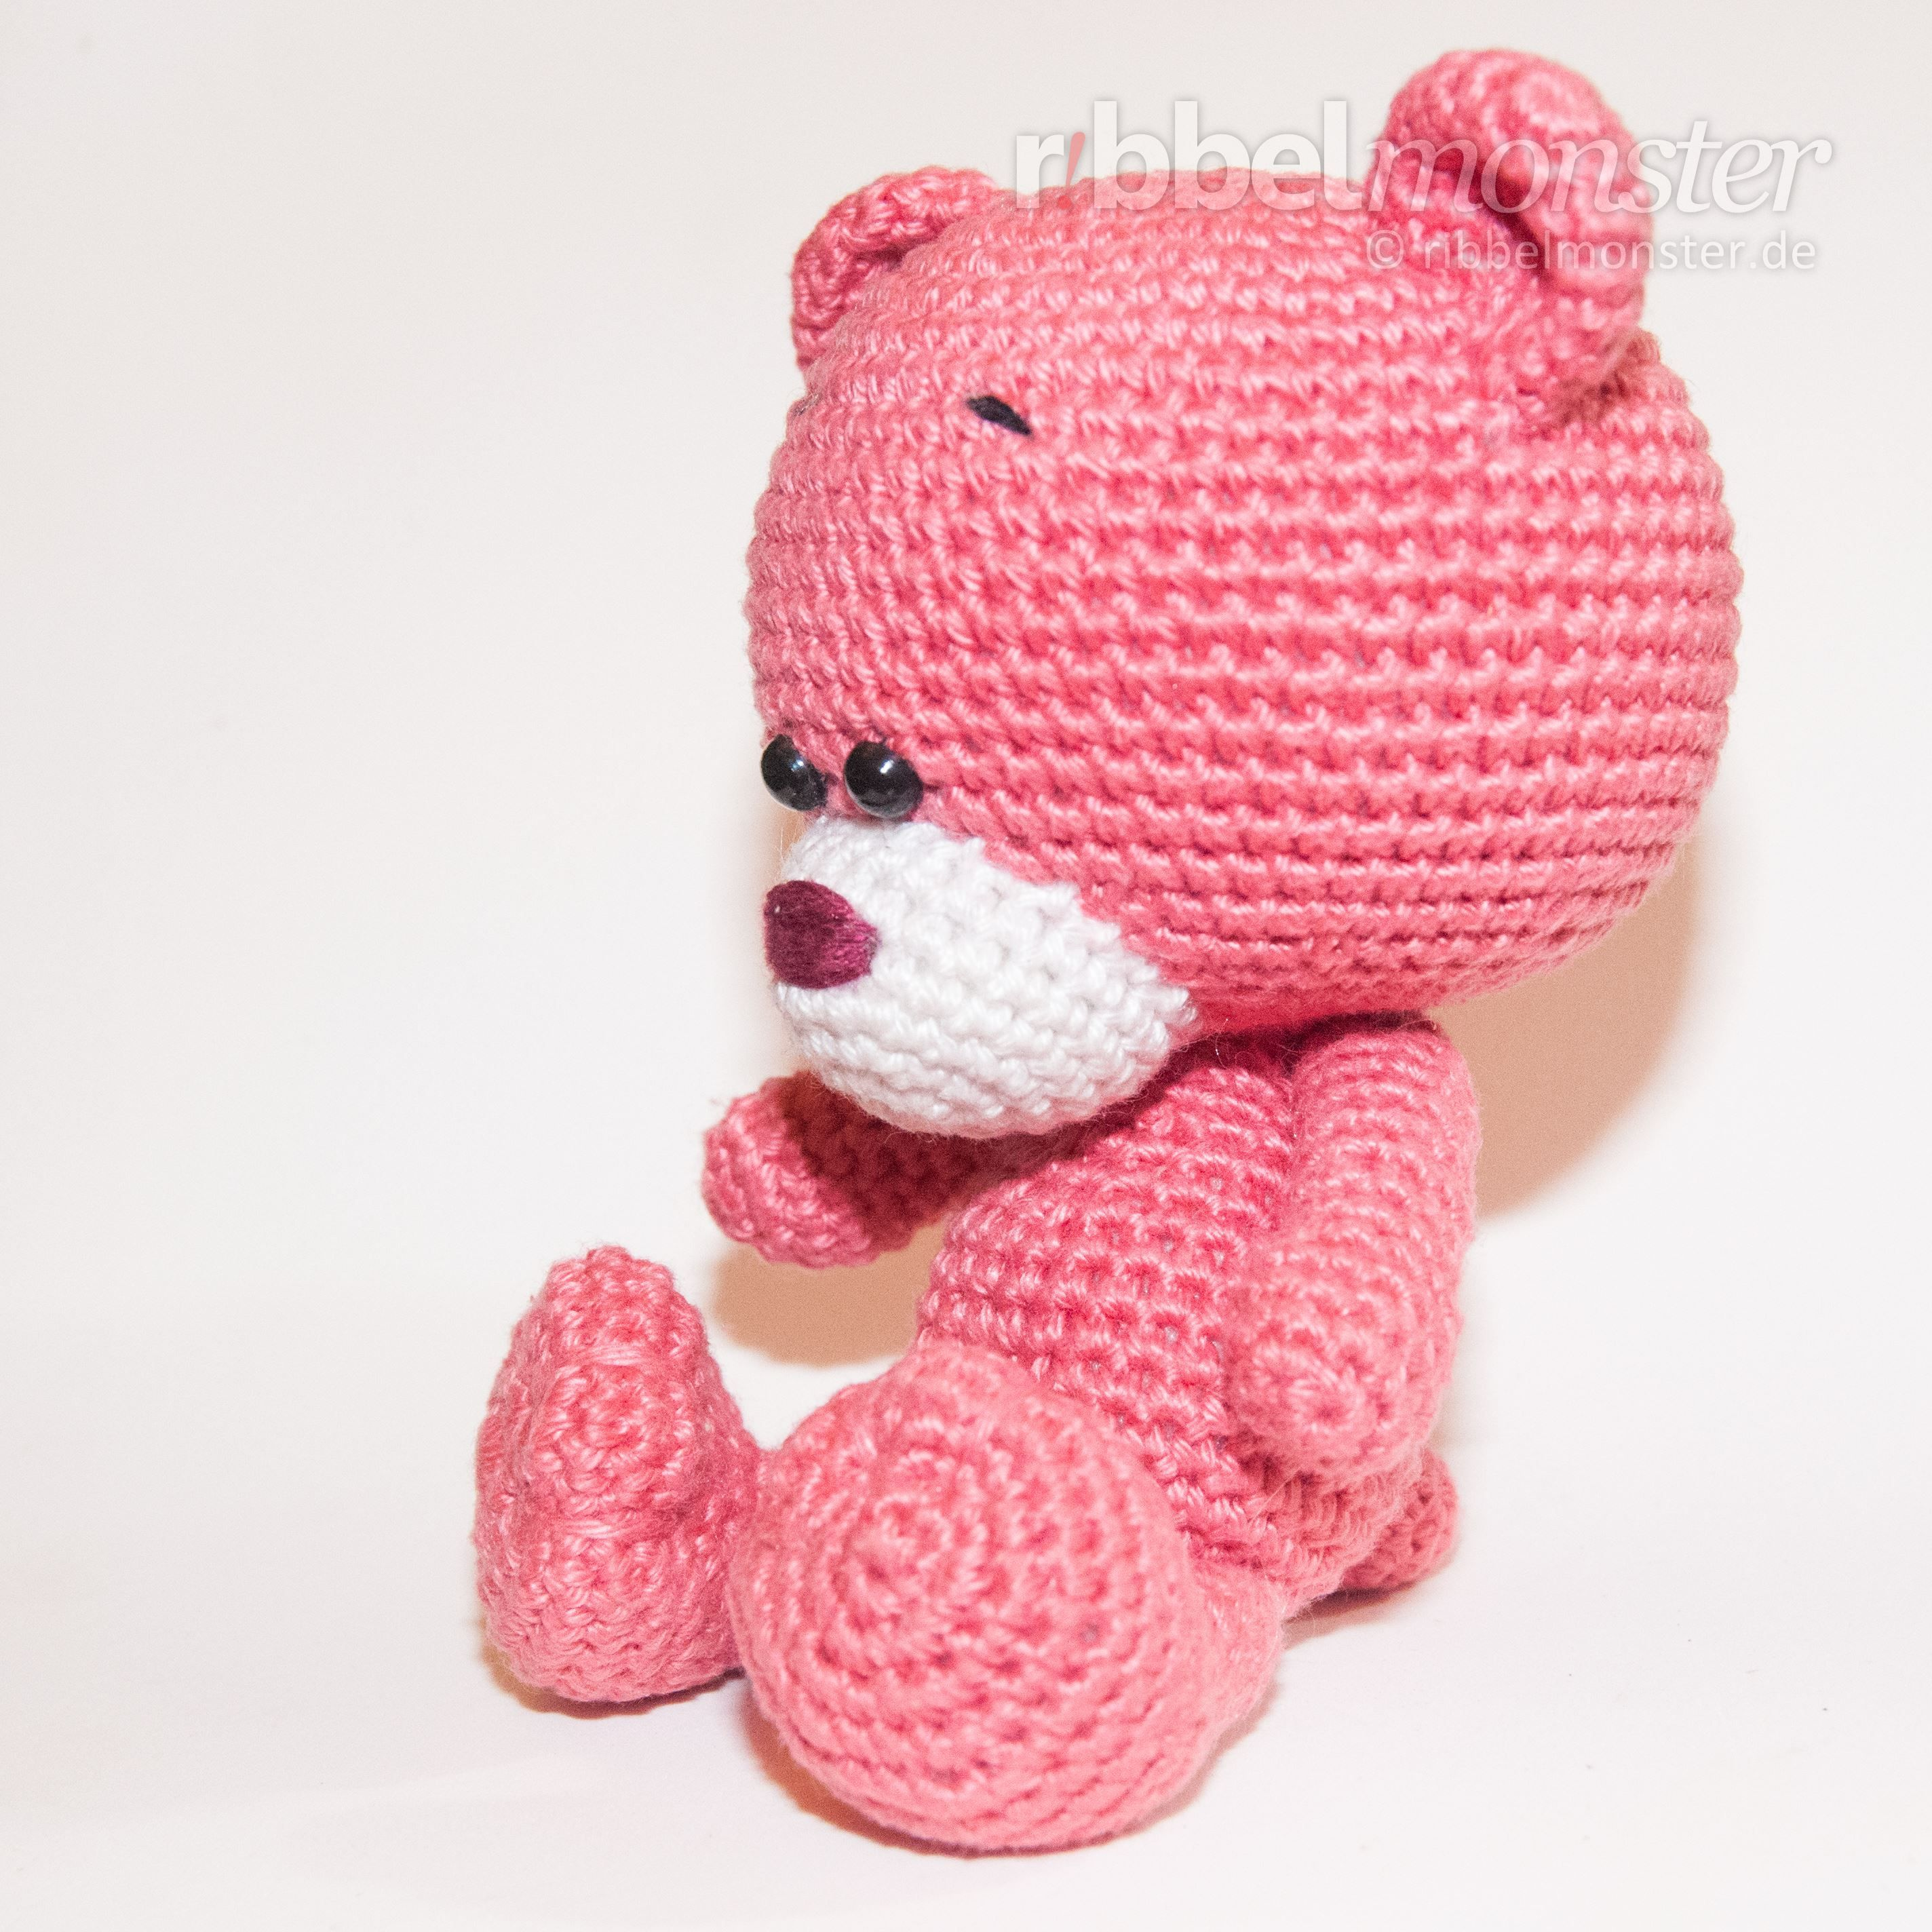 Bär häkeln // Teddy // Amigurumi // DIY-PDF | 2848x2848